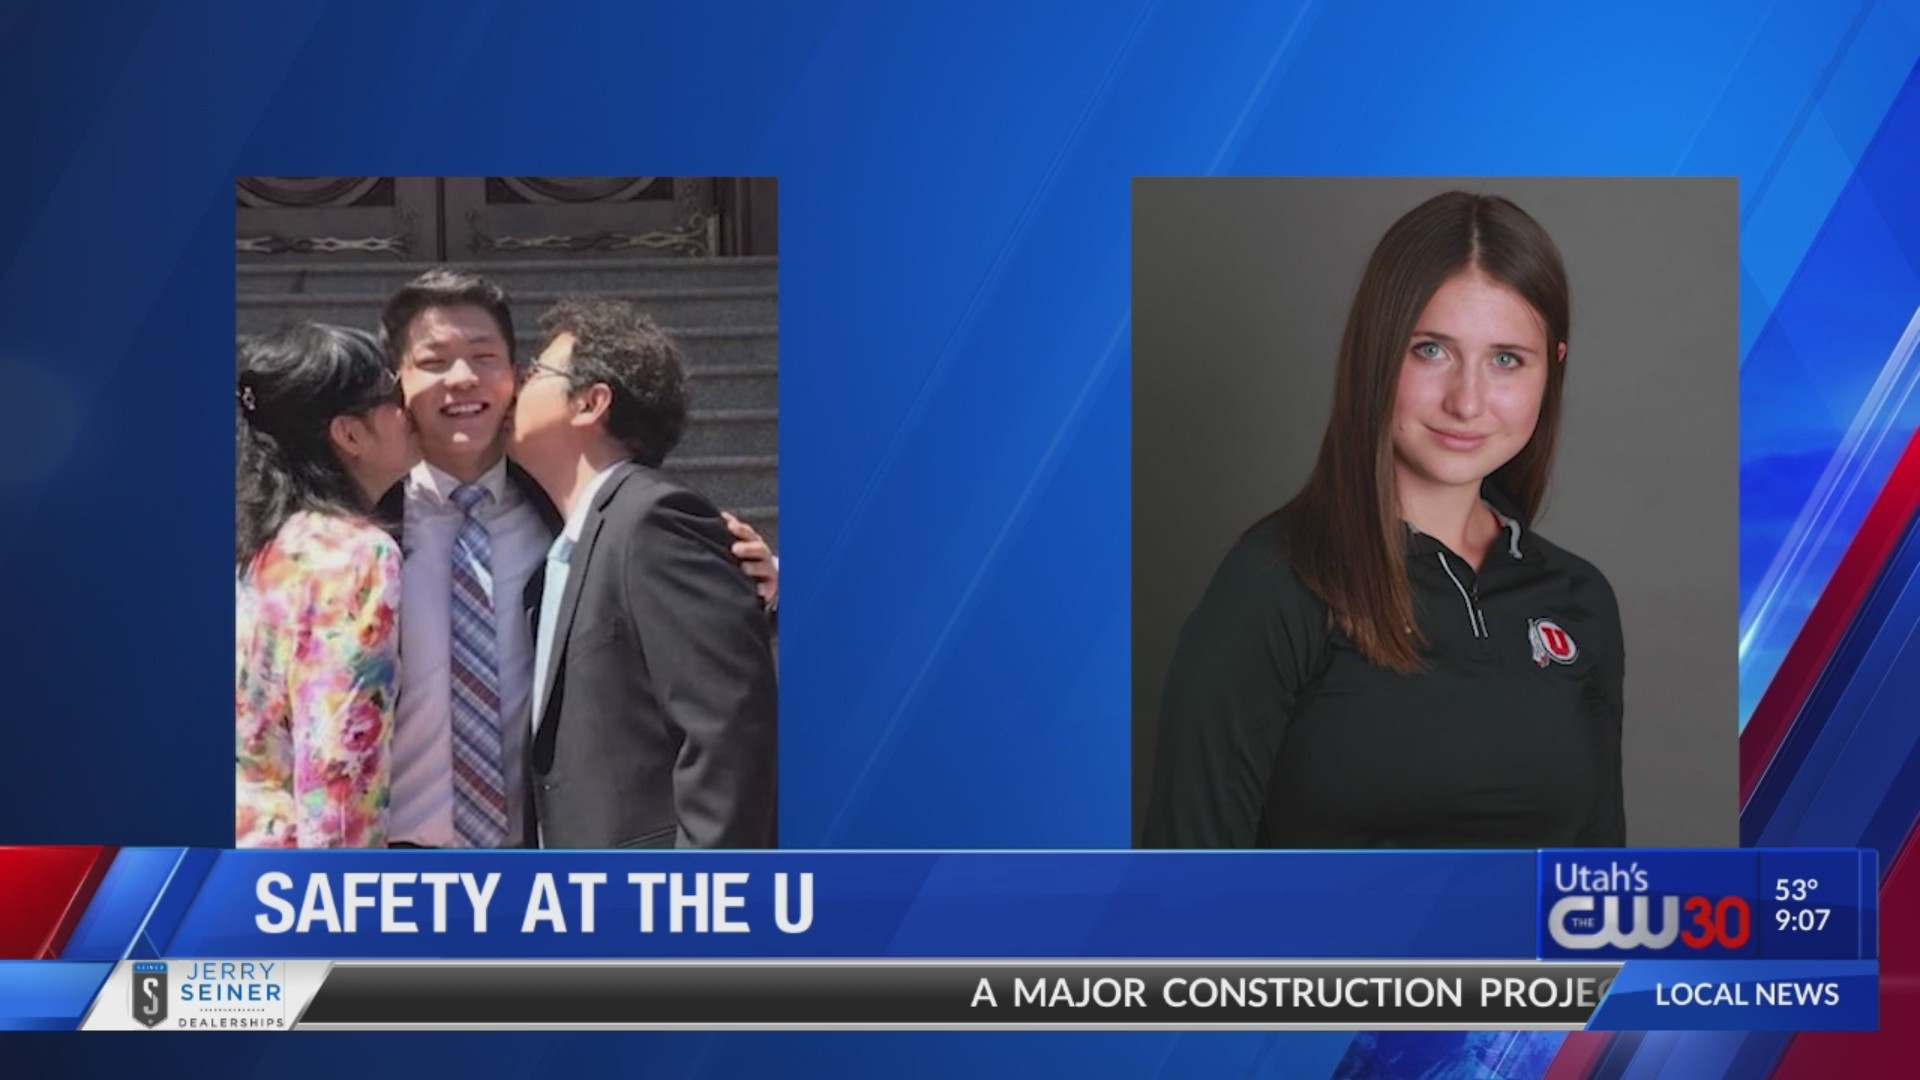 University of Utah campus safety